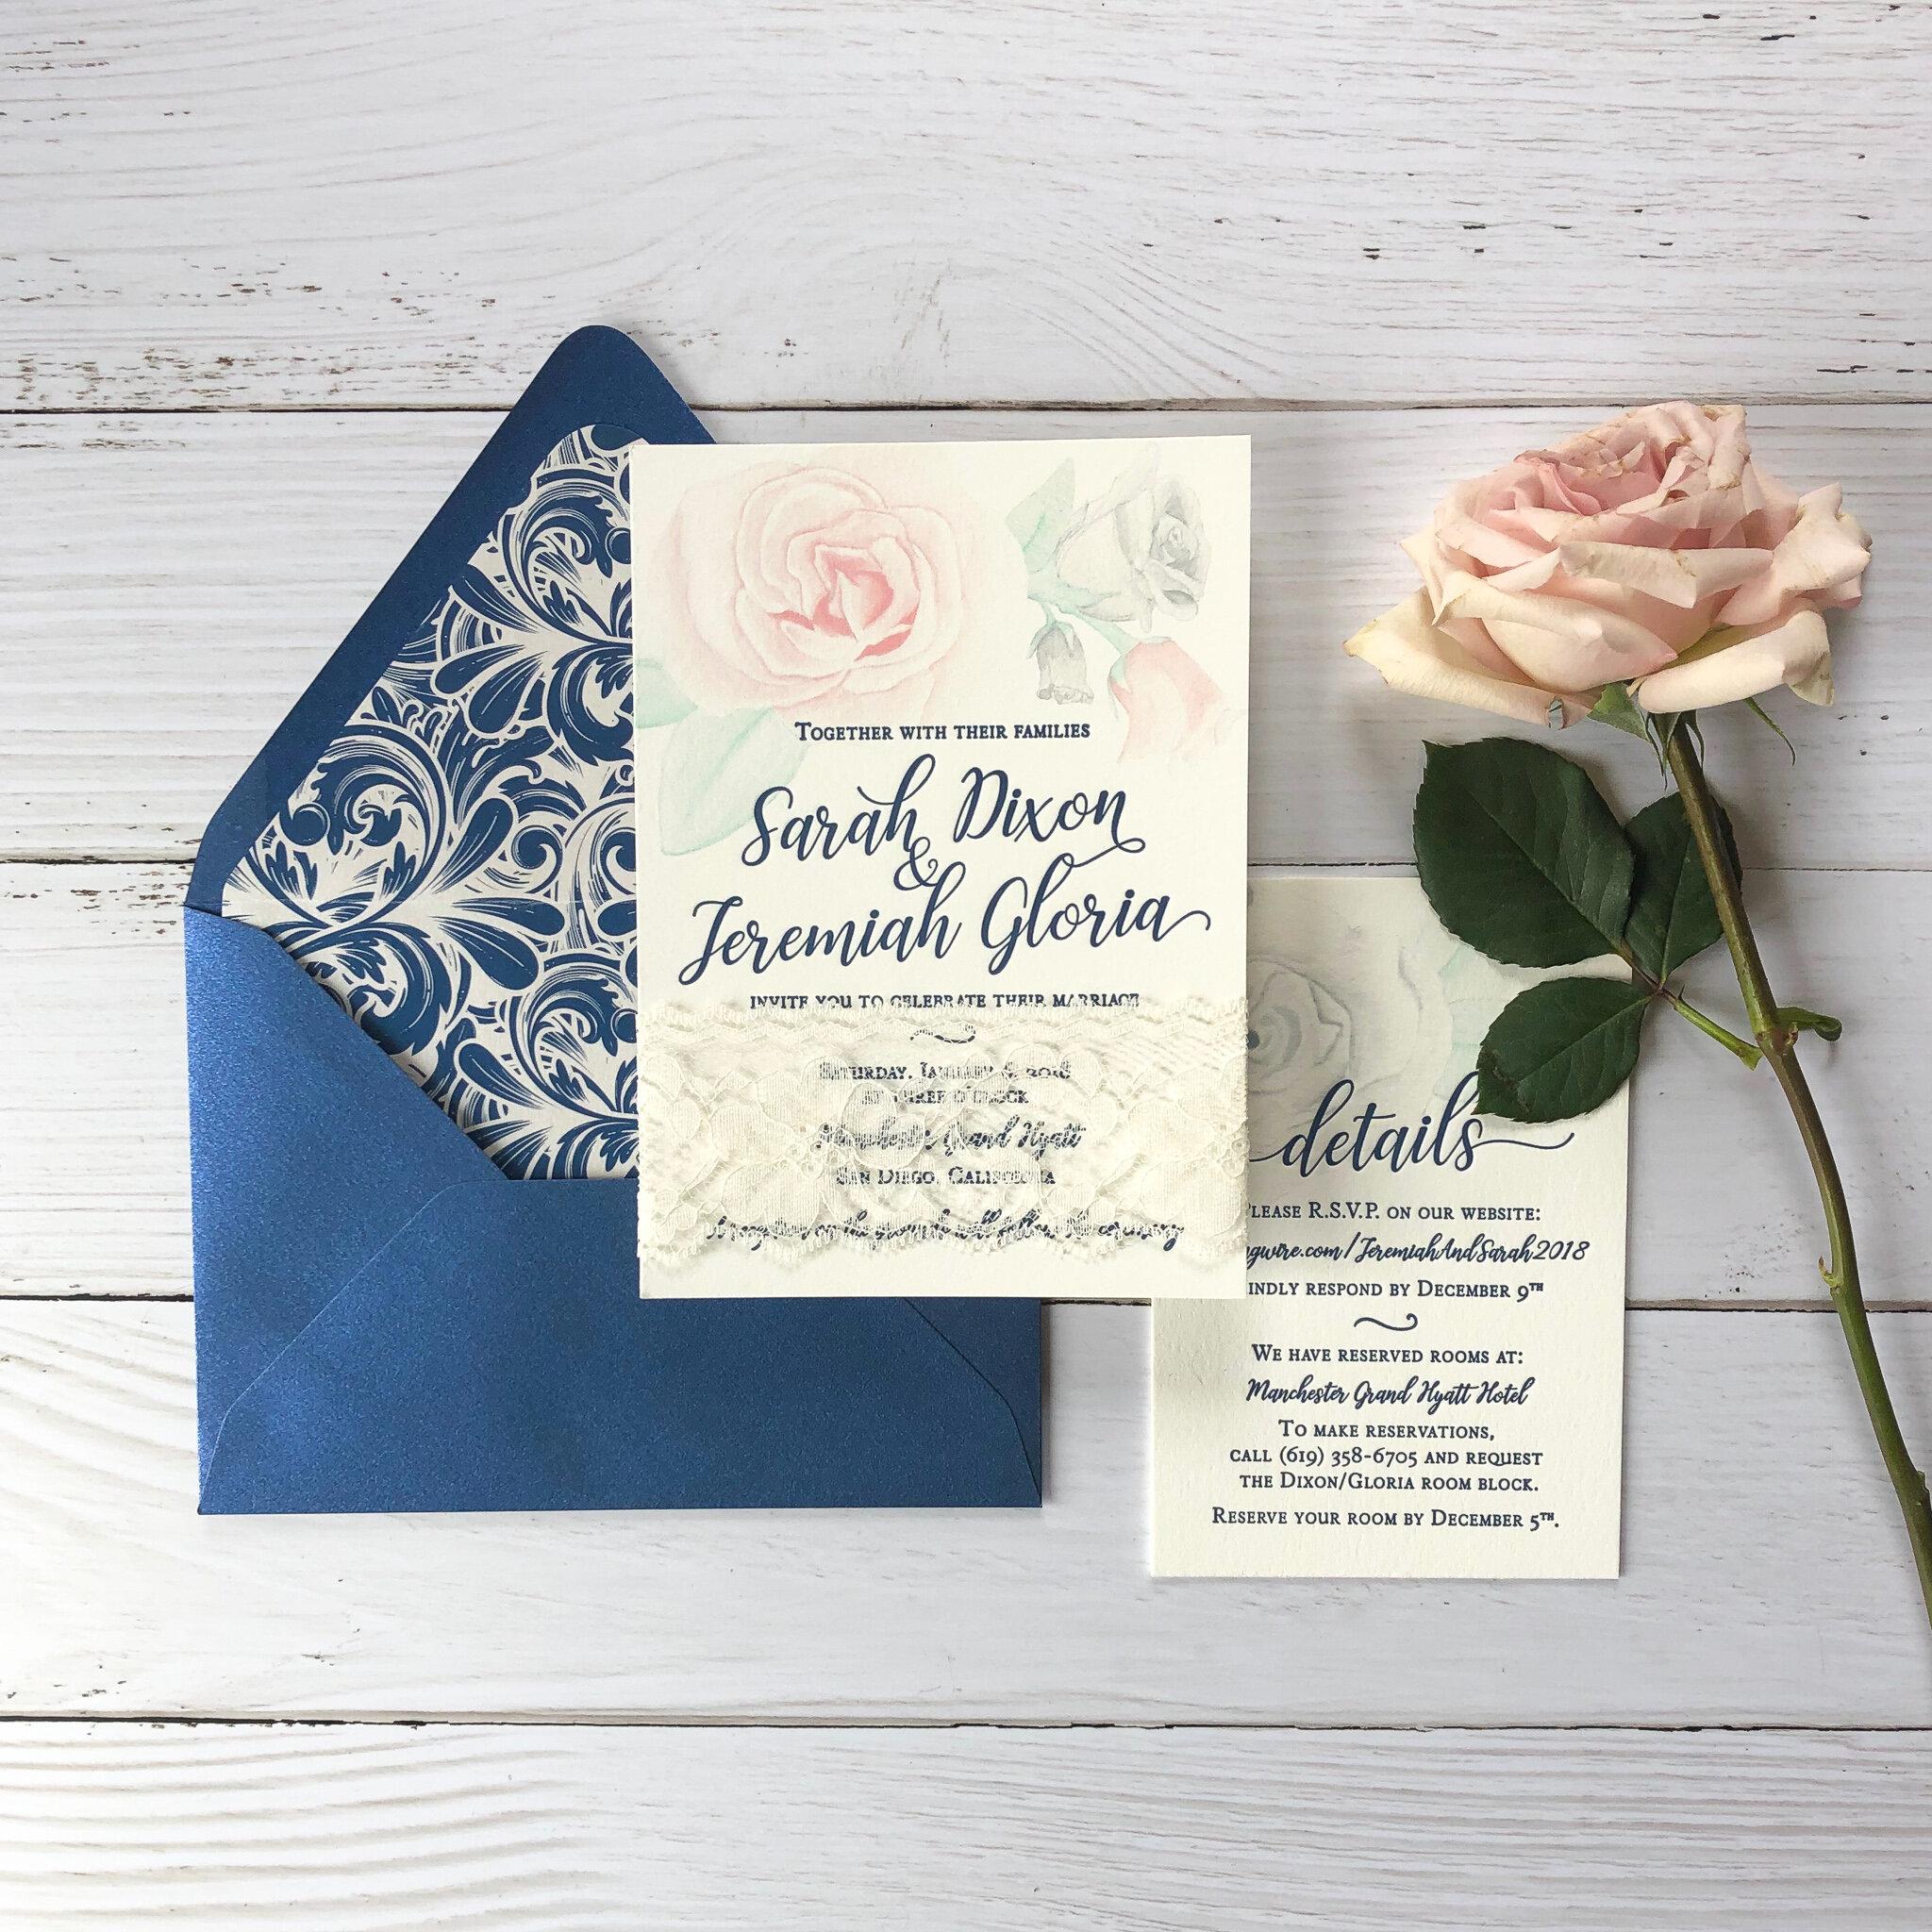 TypeA_RomanticRose_Winter_Wedding-Letterpress-InvitationSuite2.jpg